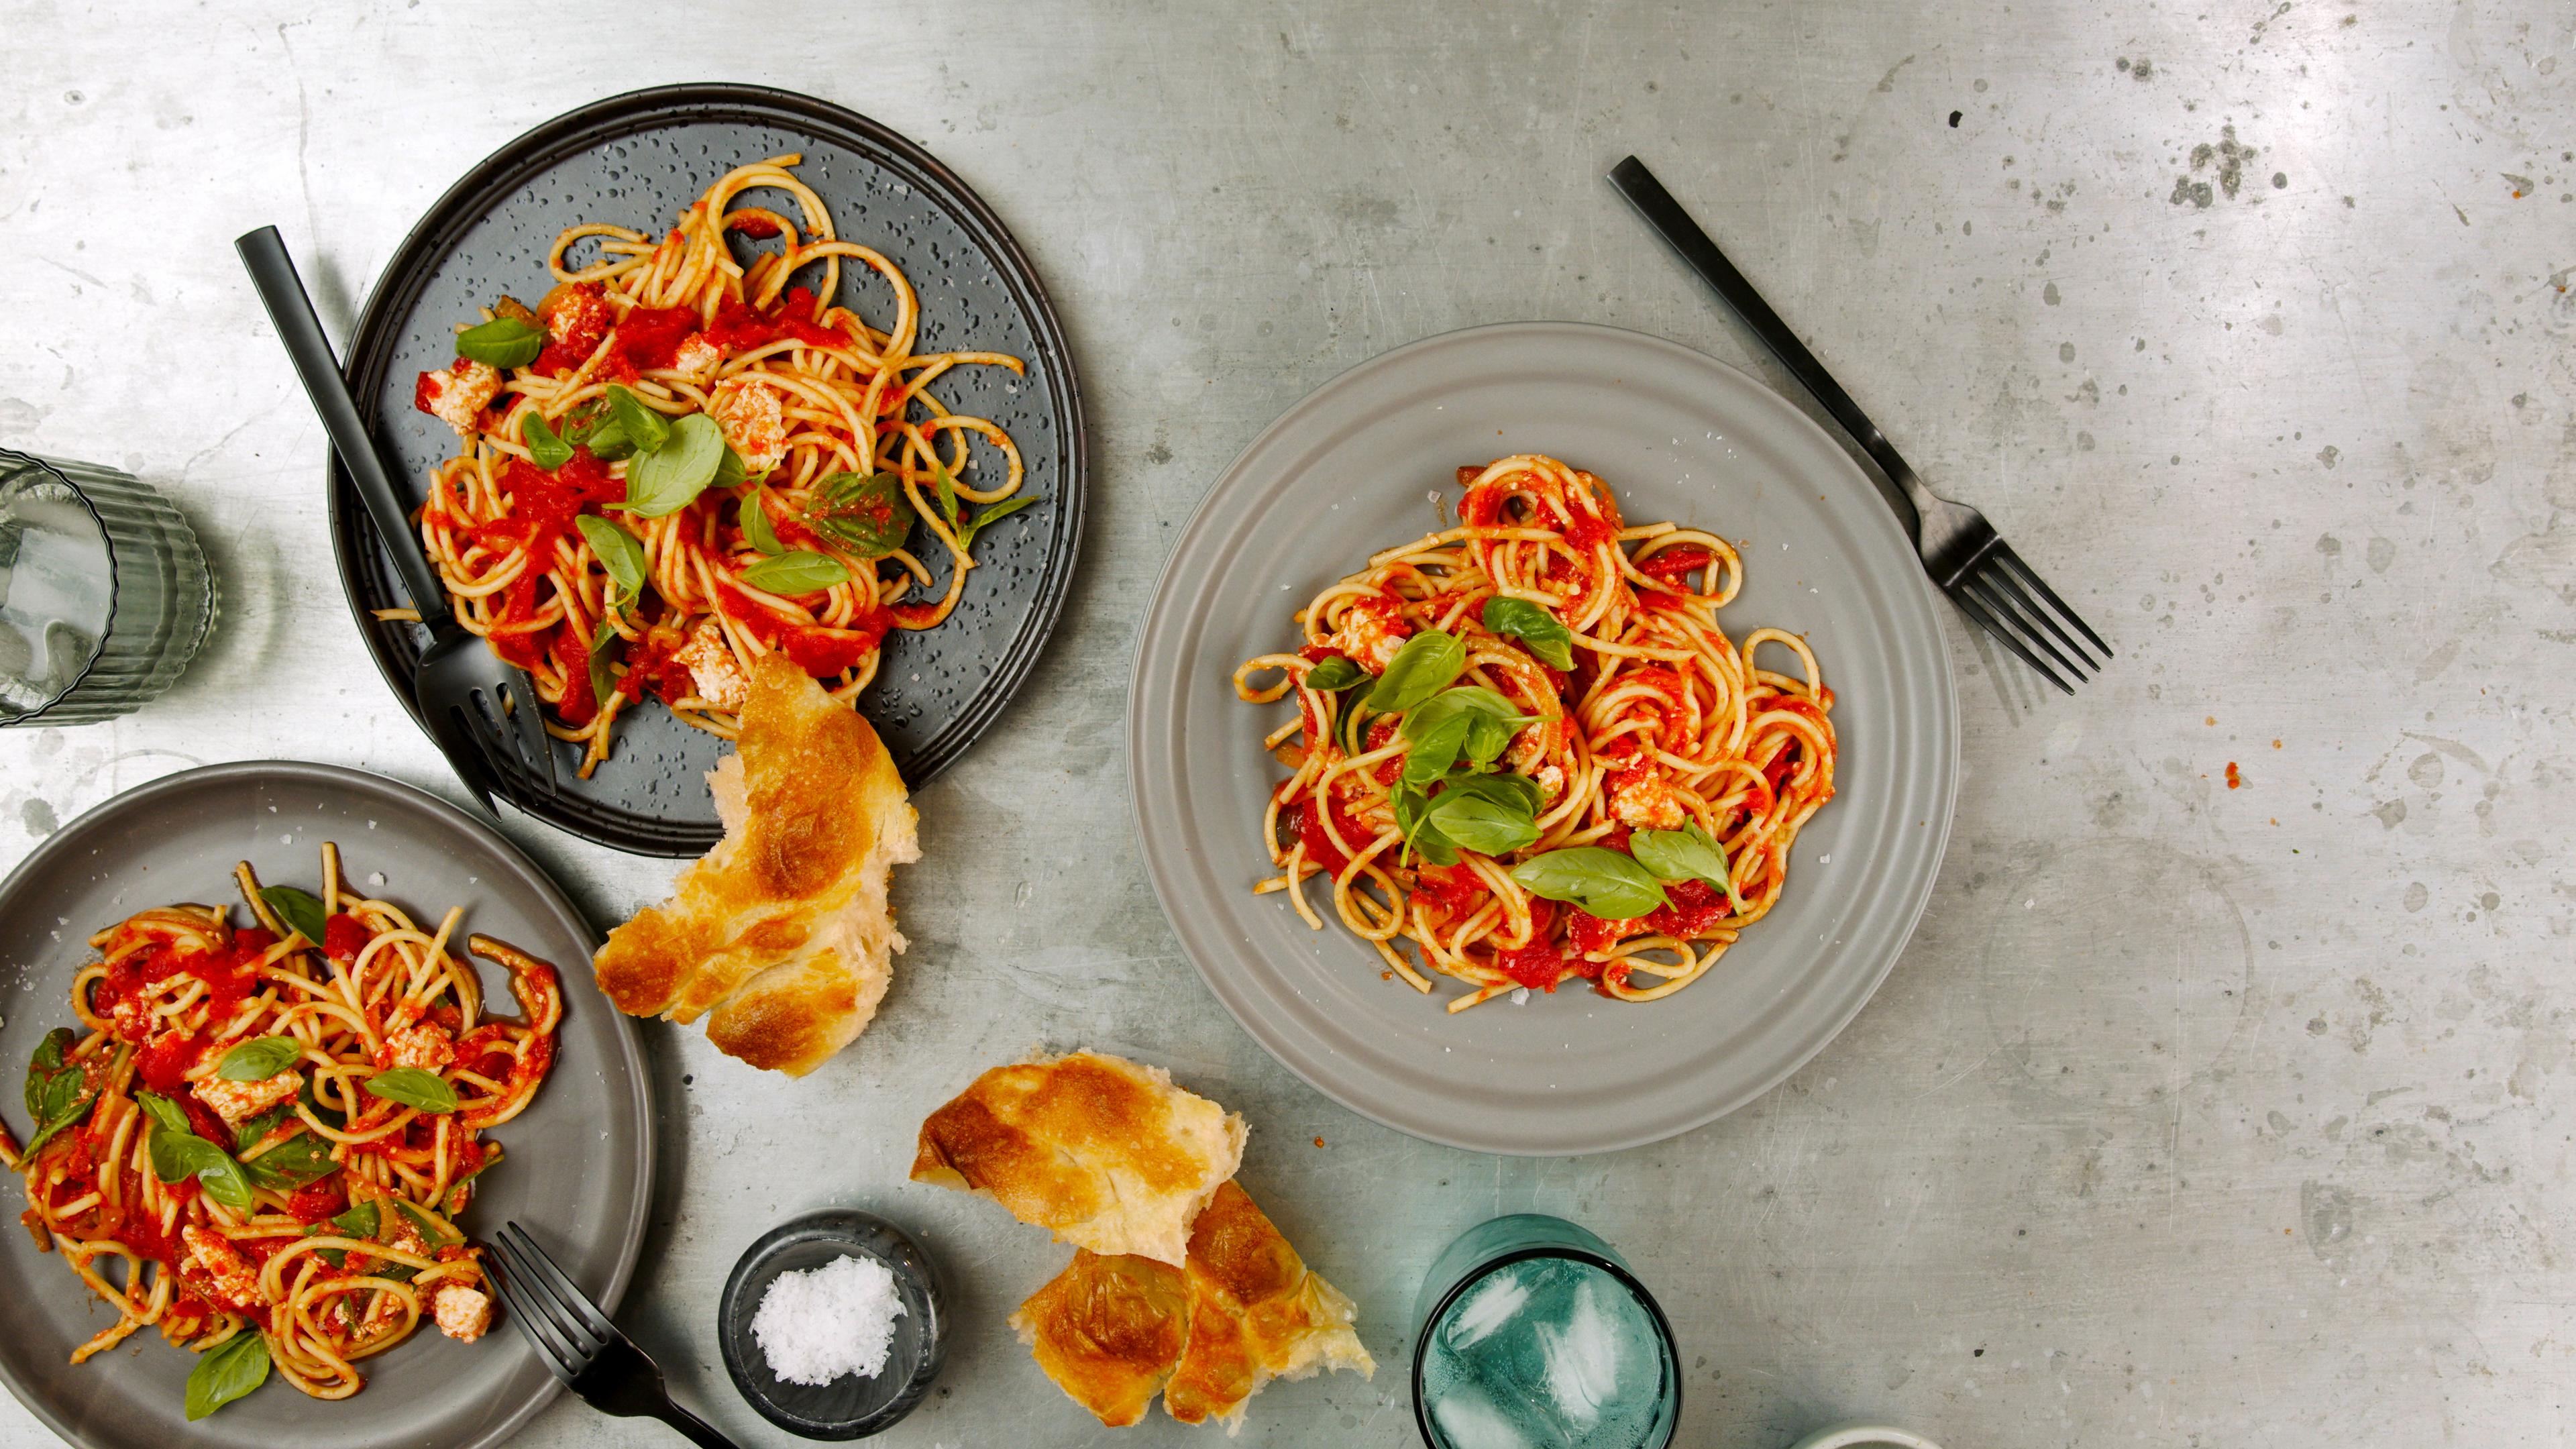 Spaghetti with Tomato & Ricotta